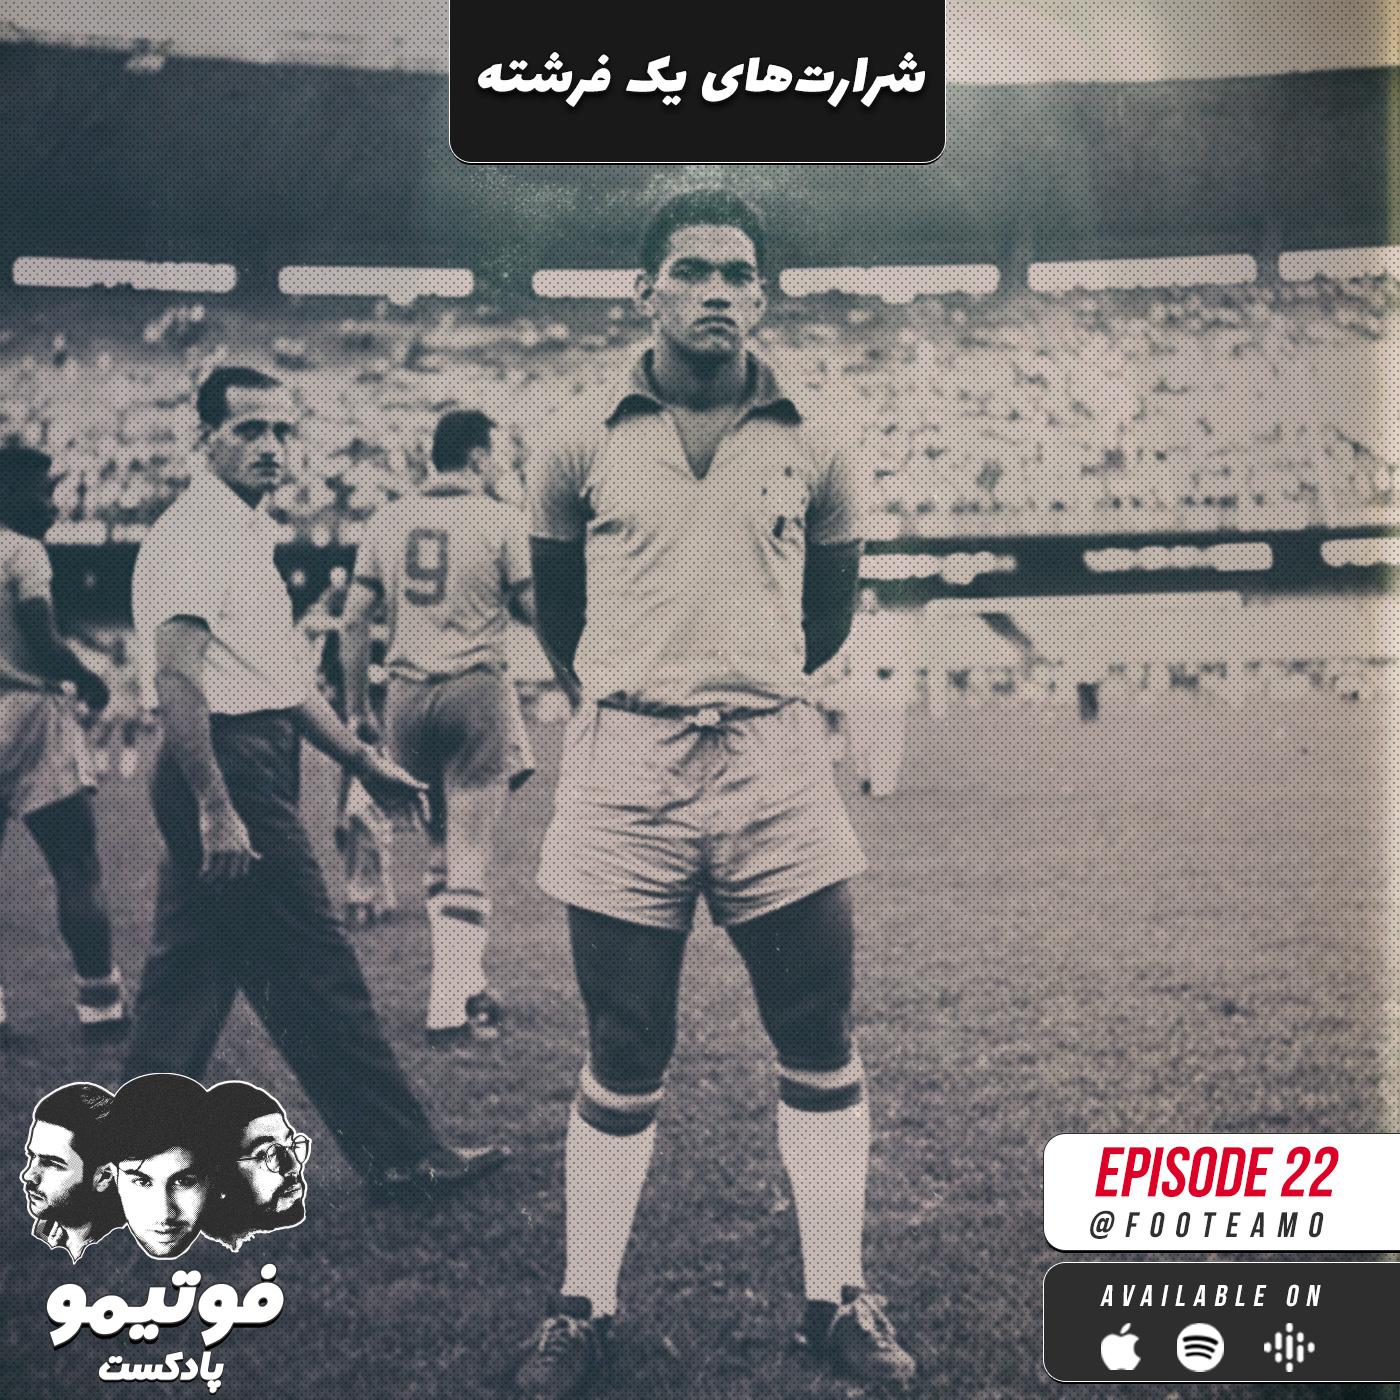 Poster Episode22 پادکست فوتبالی فوتیمو